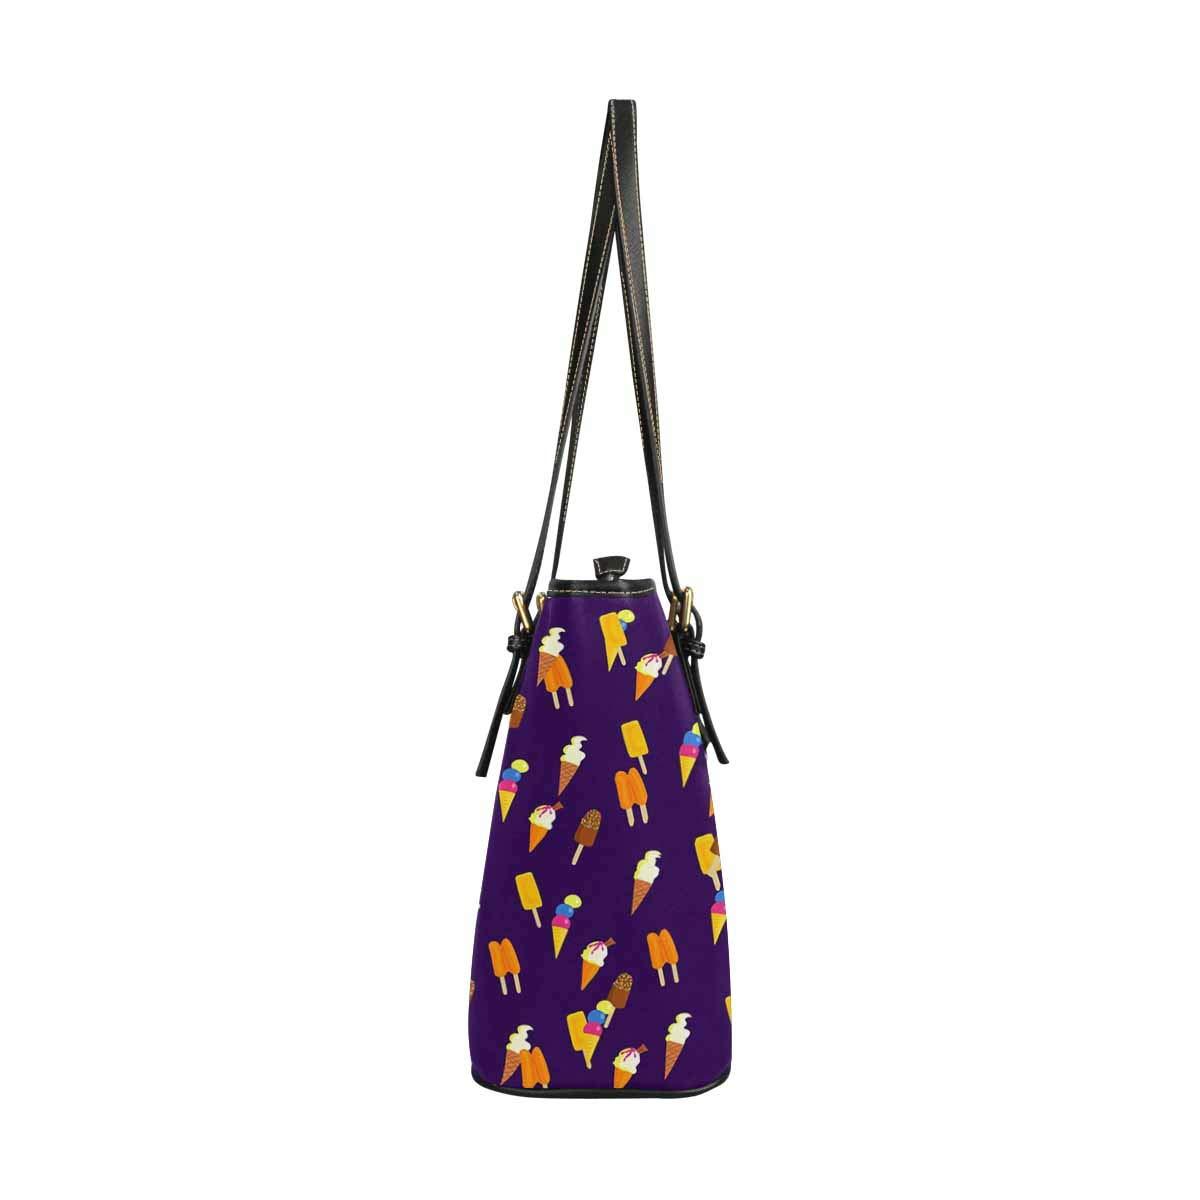 InterestPrint Womens Stylish Tote Bag Travel Shoulder Bag